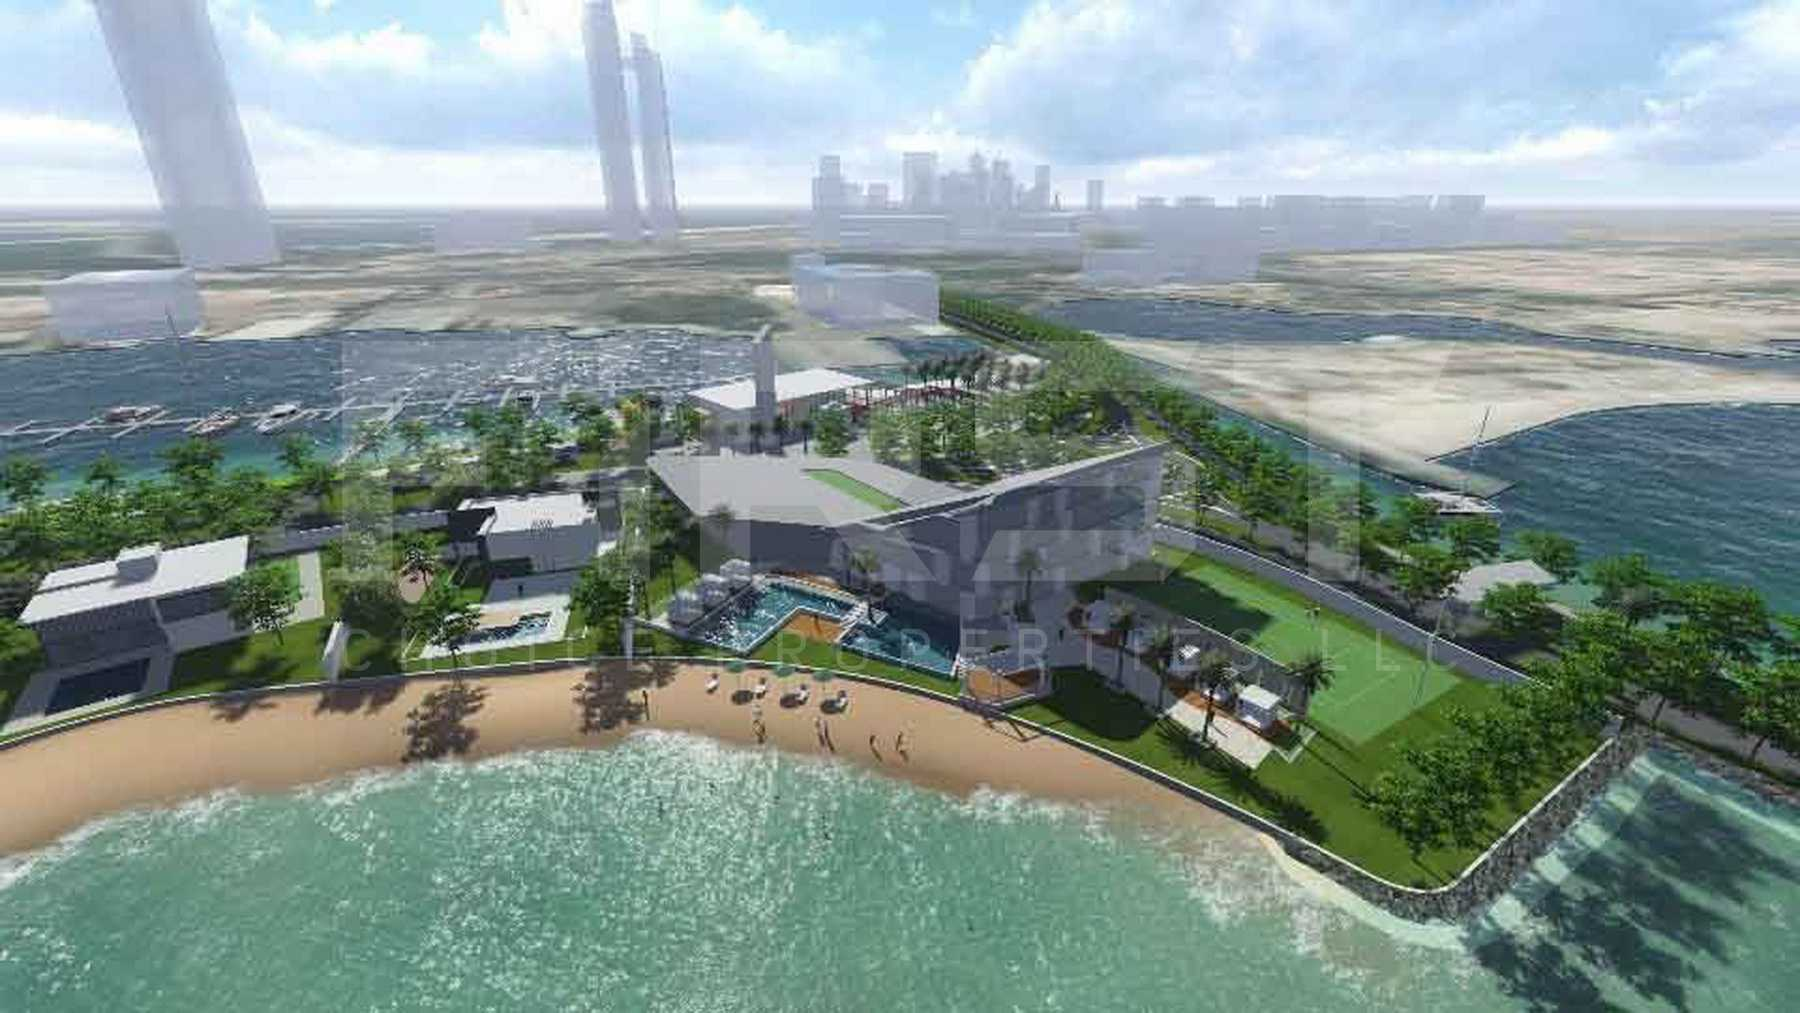 External Photos of NAreel Island Abu Dhabi UAE (2).jpg